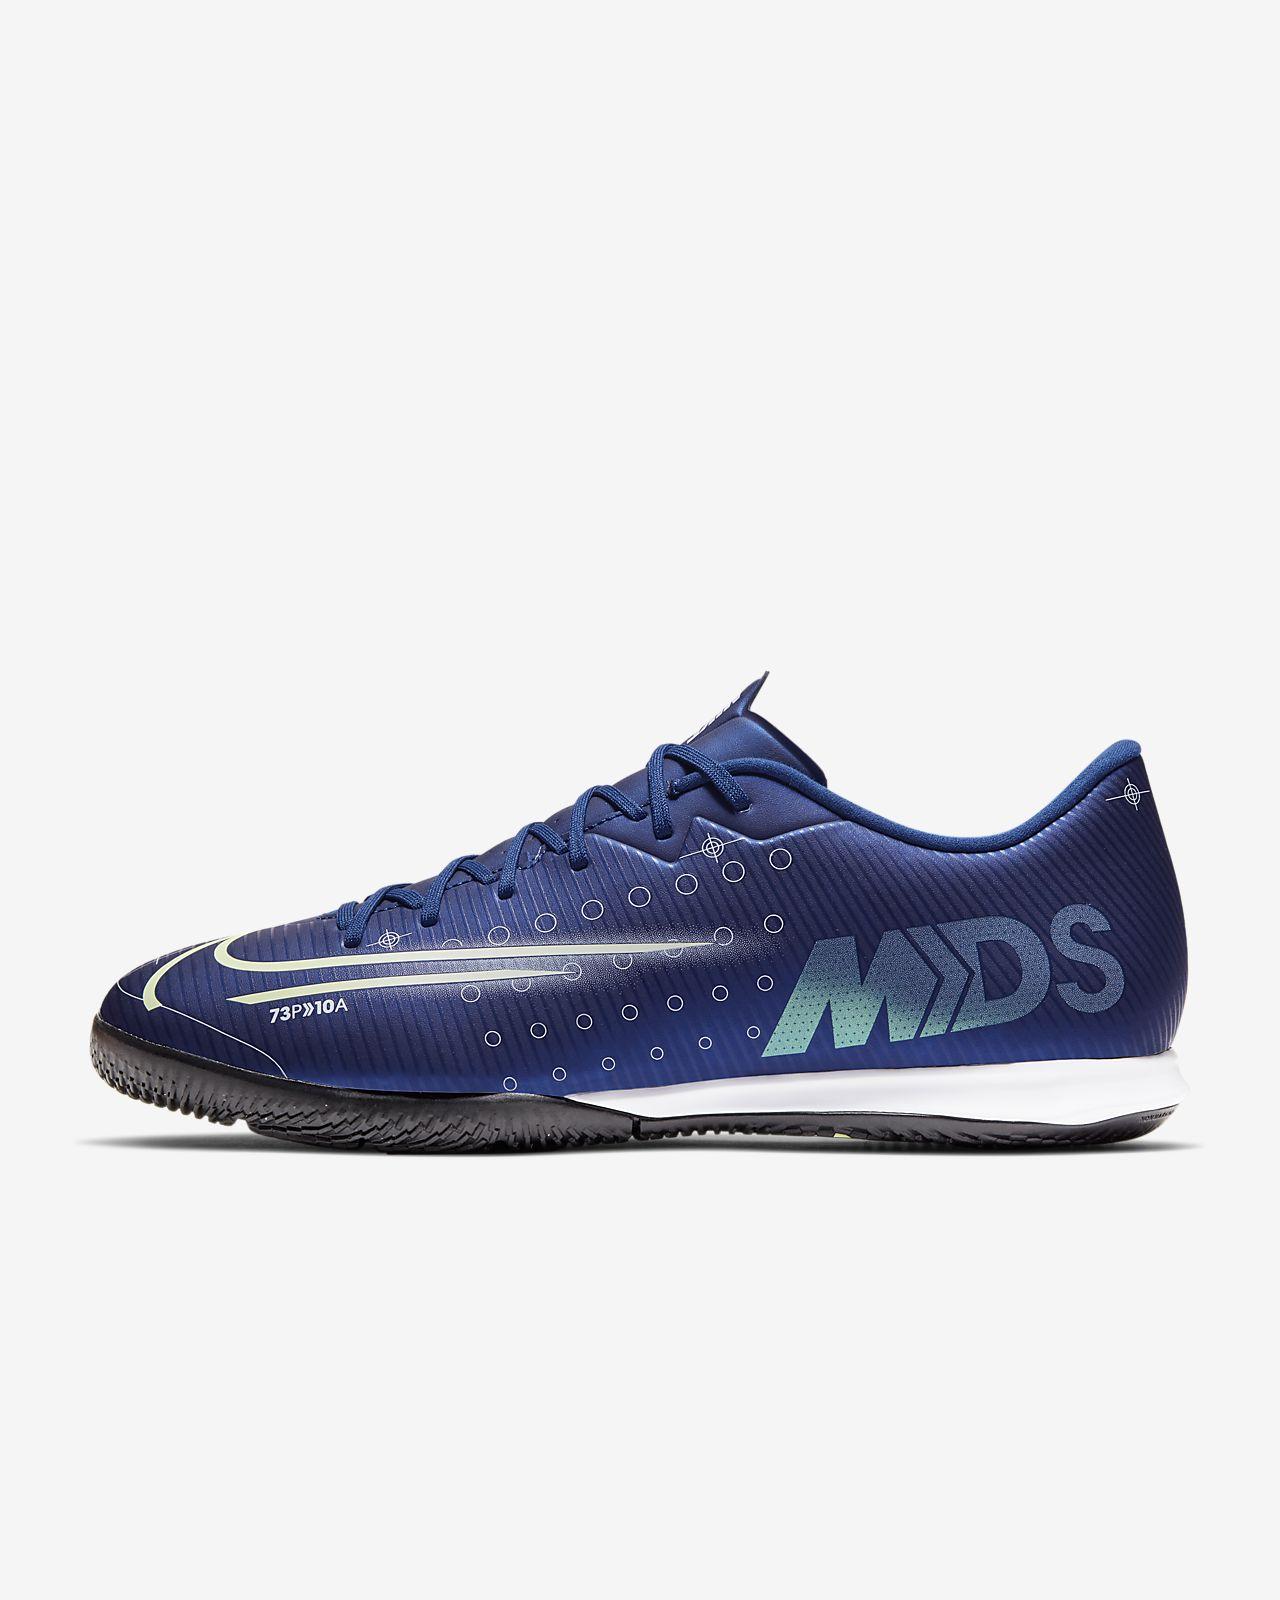 Calzado de fútbol para cancha cubierta Nike Mercurial Vapor 13 Academy MDS IC